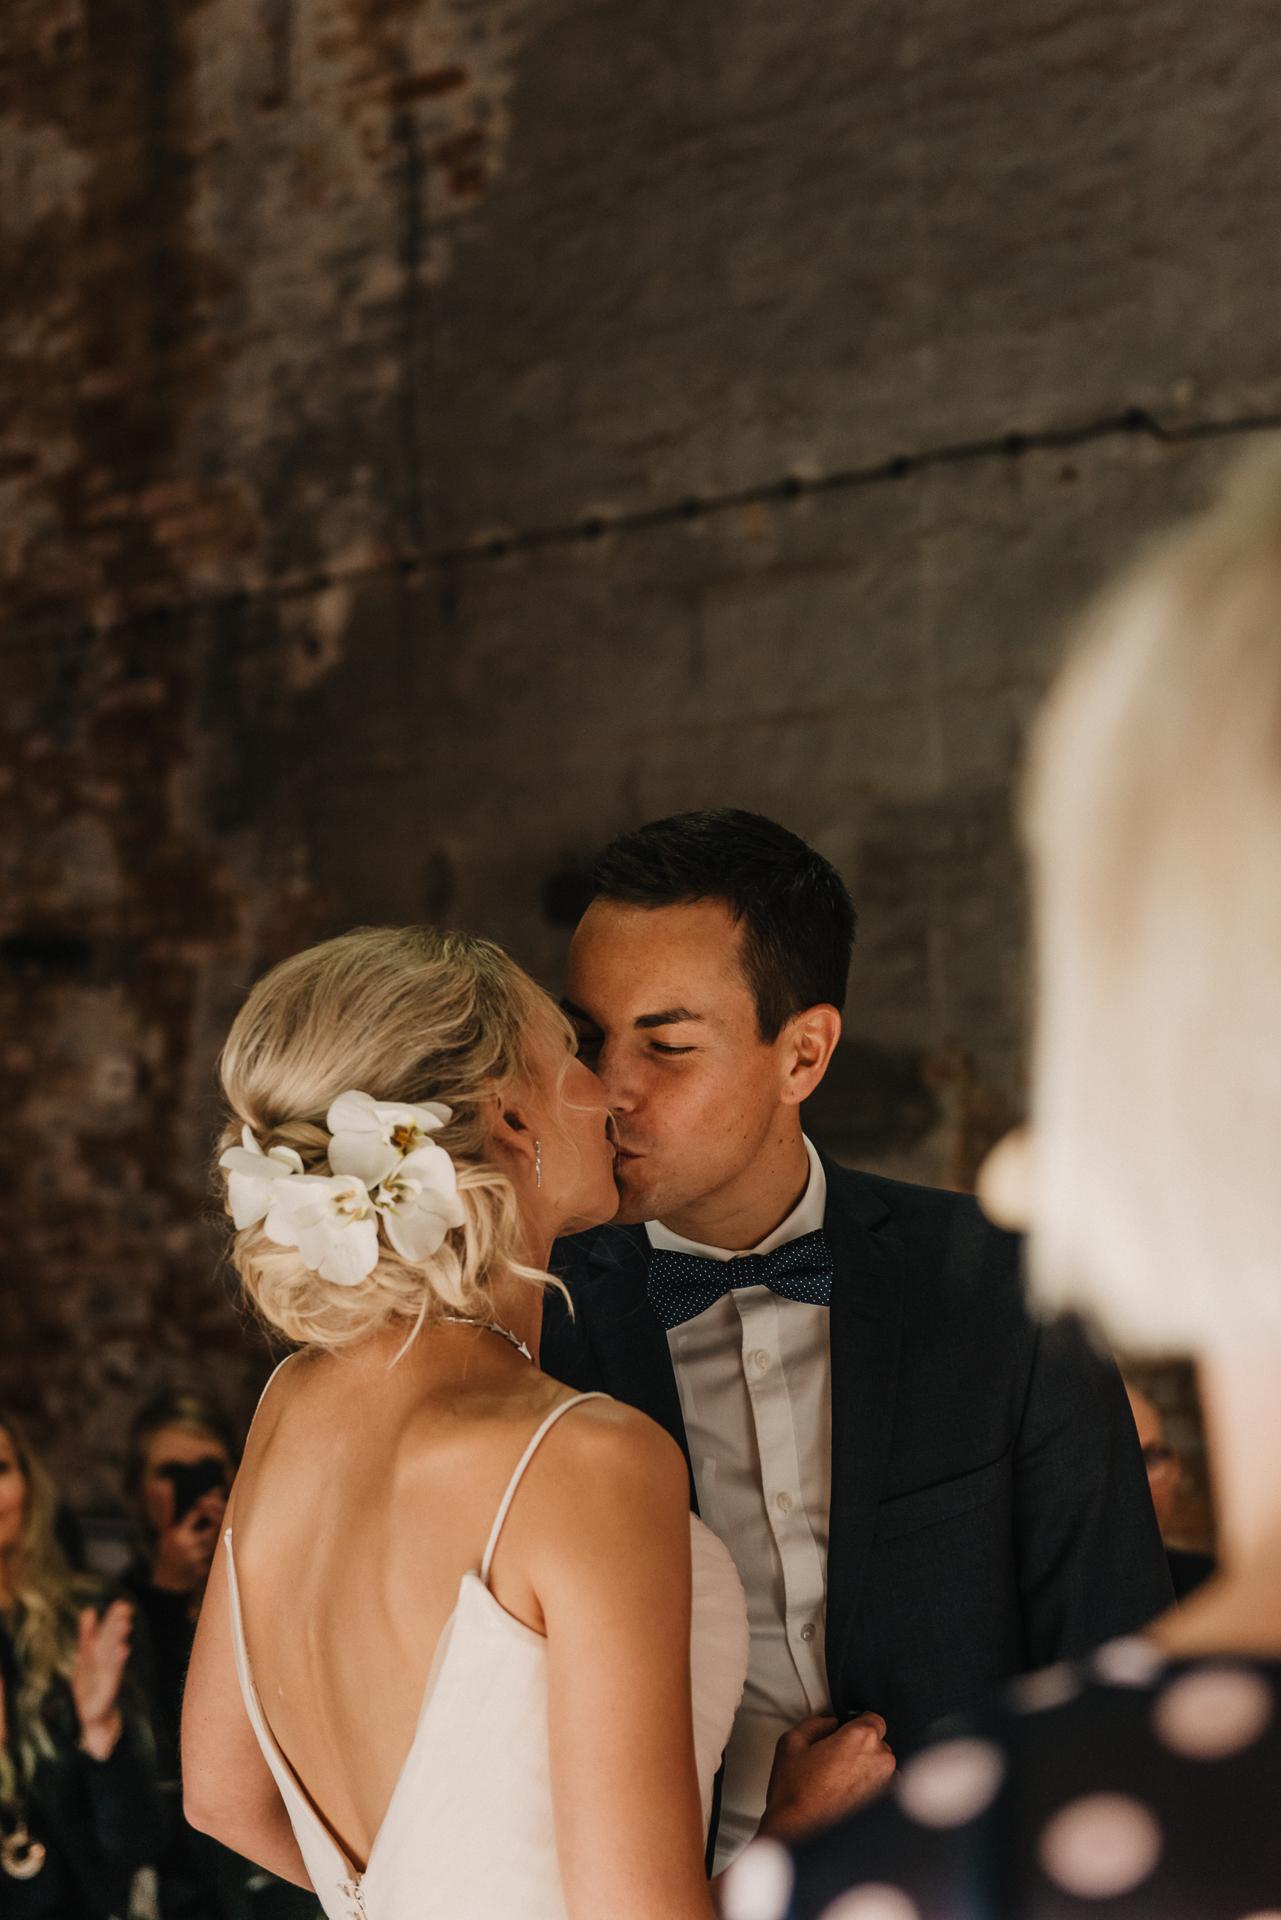 Zweinander-LeonoreHerzog-WeddingMarket-OnTour20191110-8966